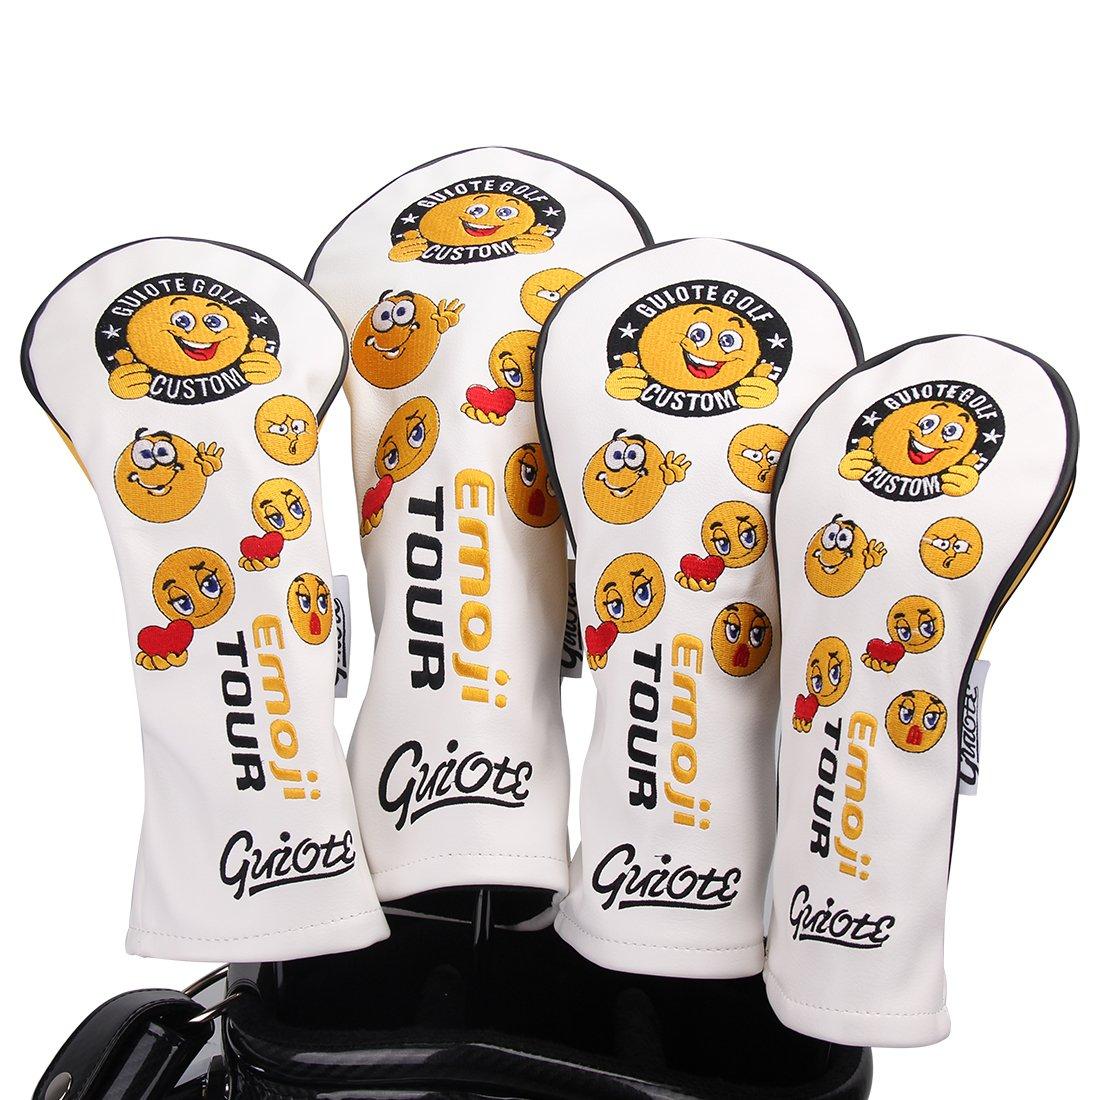 Guiote ゴルフヘッドカバー Golf head covers クラブヘッドカバー ウッドカバー ドライバー 新デザイン 交換可能な番号タグ付き(#2.#3.#4.#5.X) 4個セット B07CZ2JJ18 Emoji-white Emoji-white